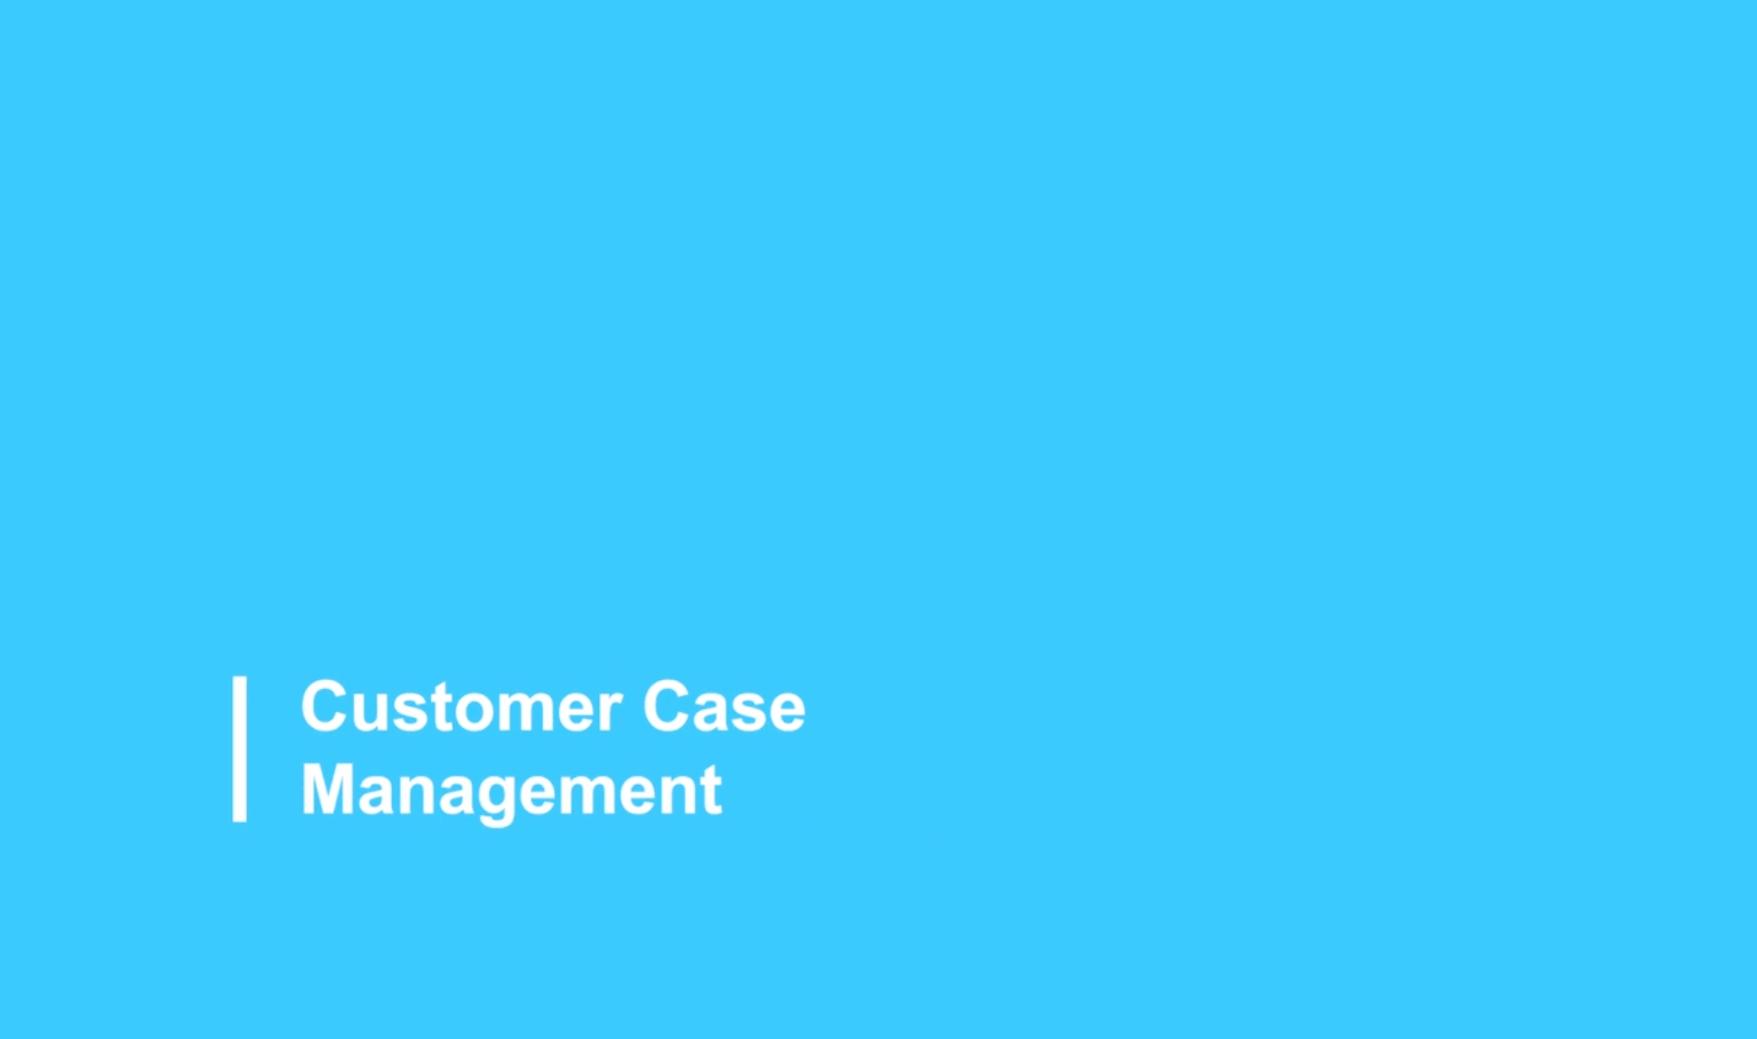 Customer Case Management